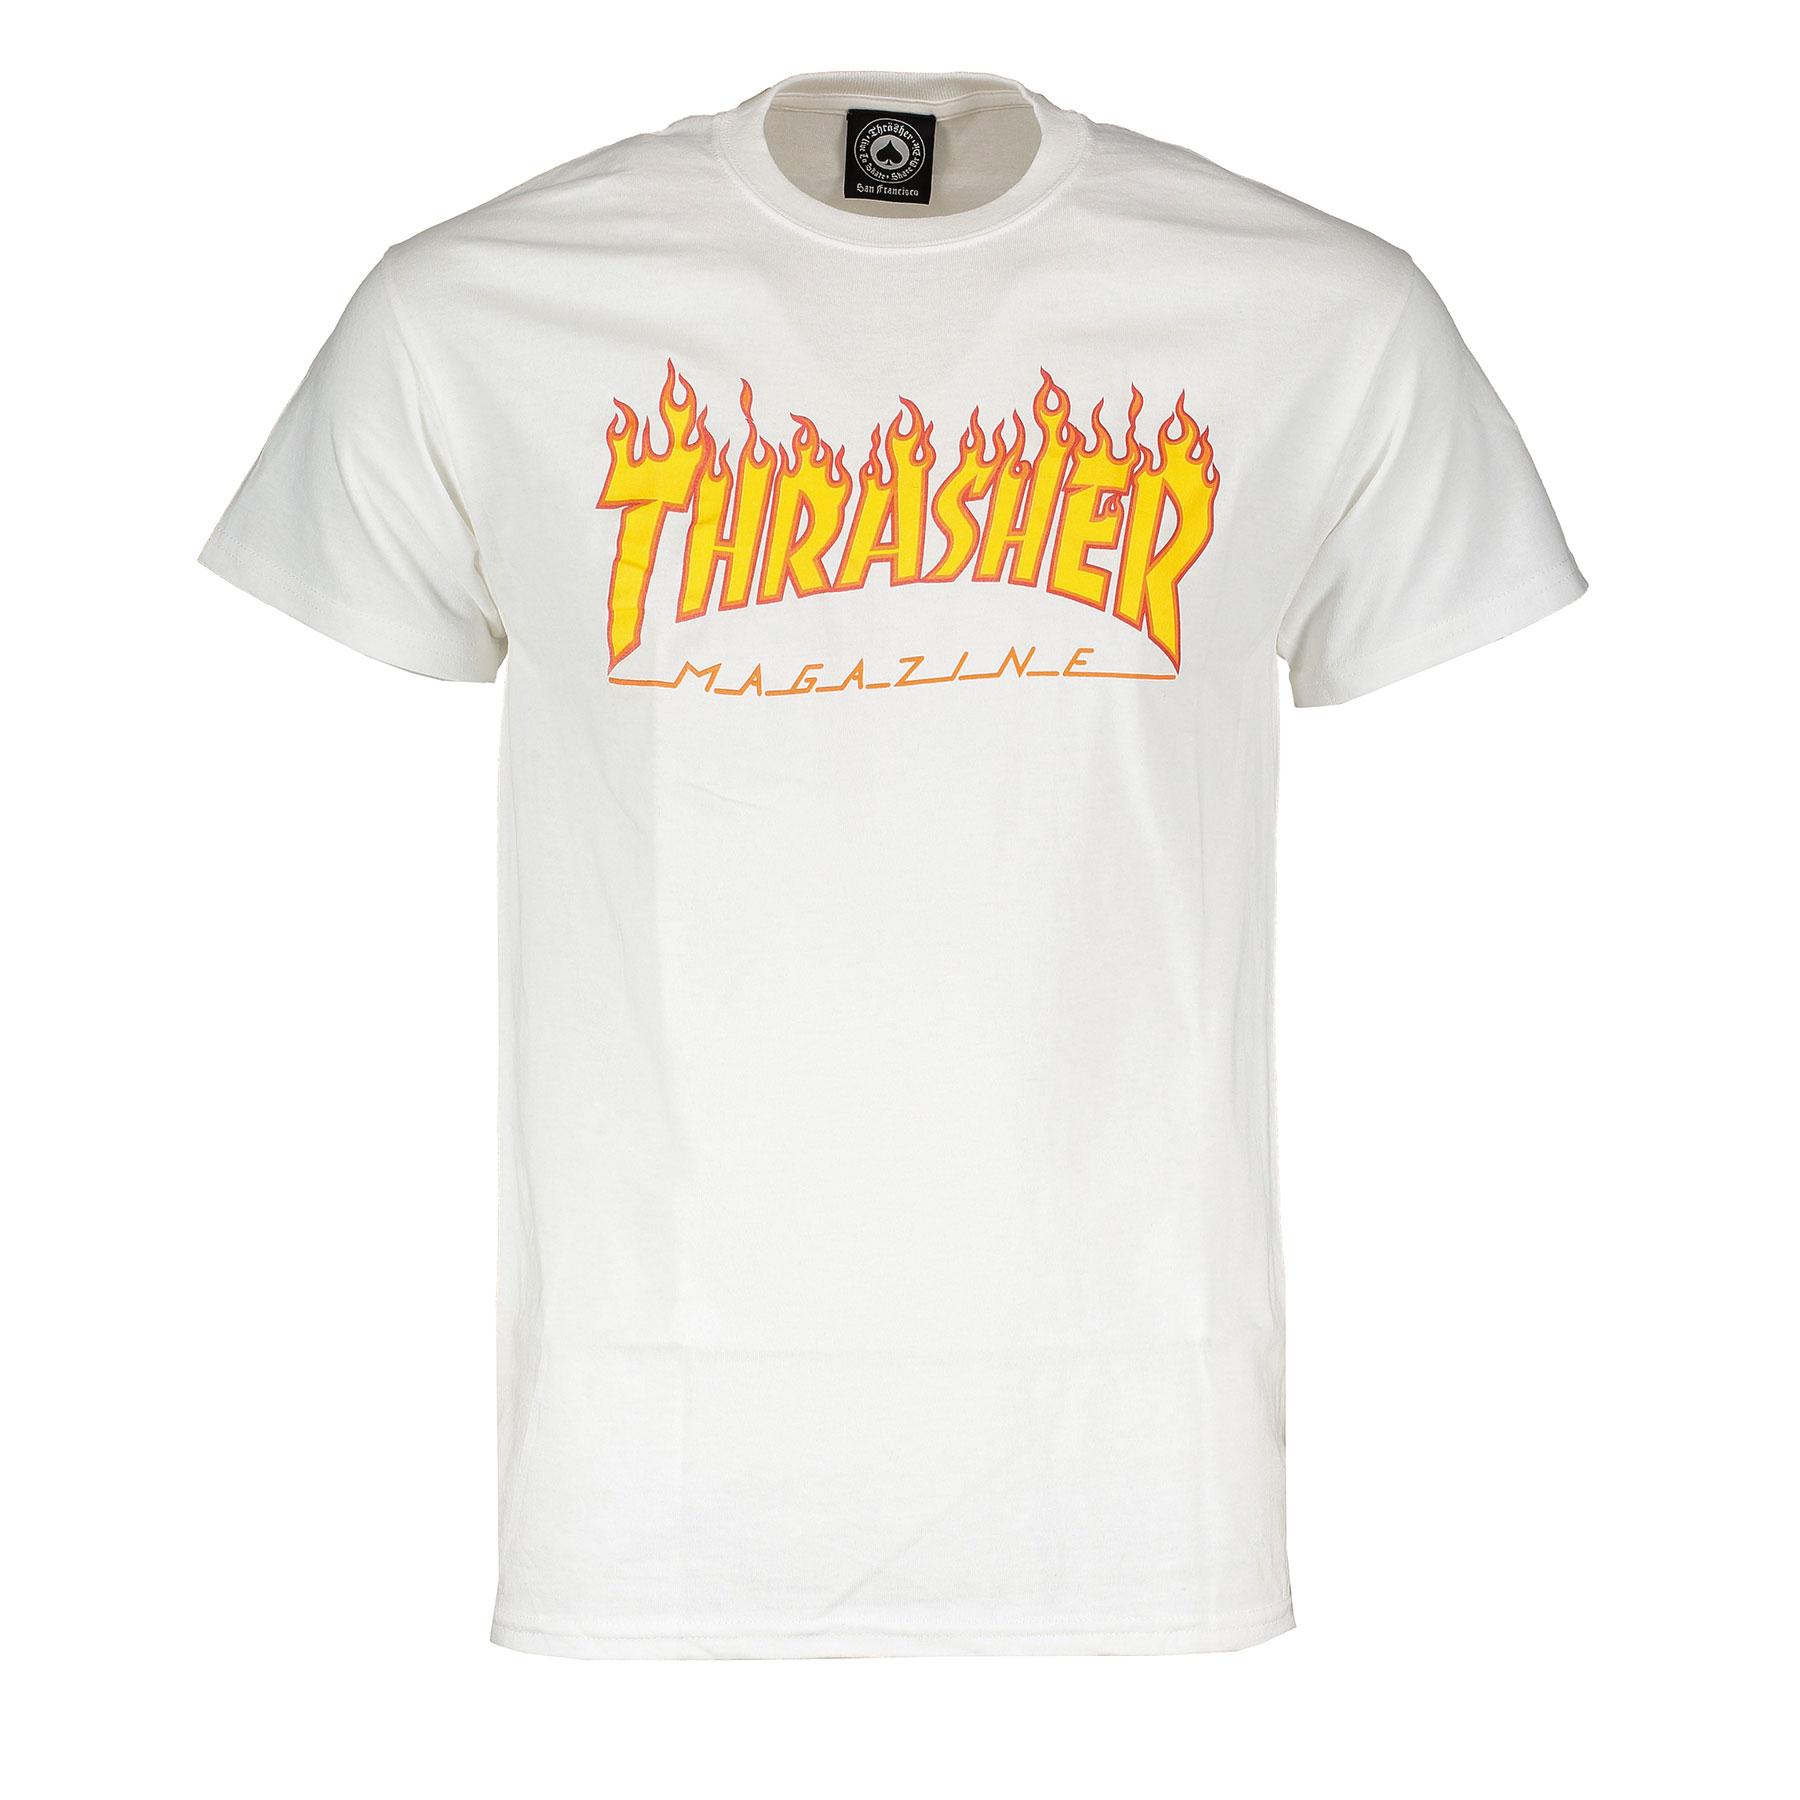 T-shirt Thrasher Magazine Flame logo bianca